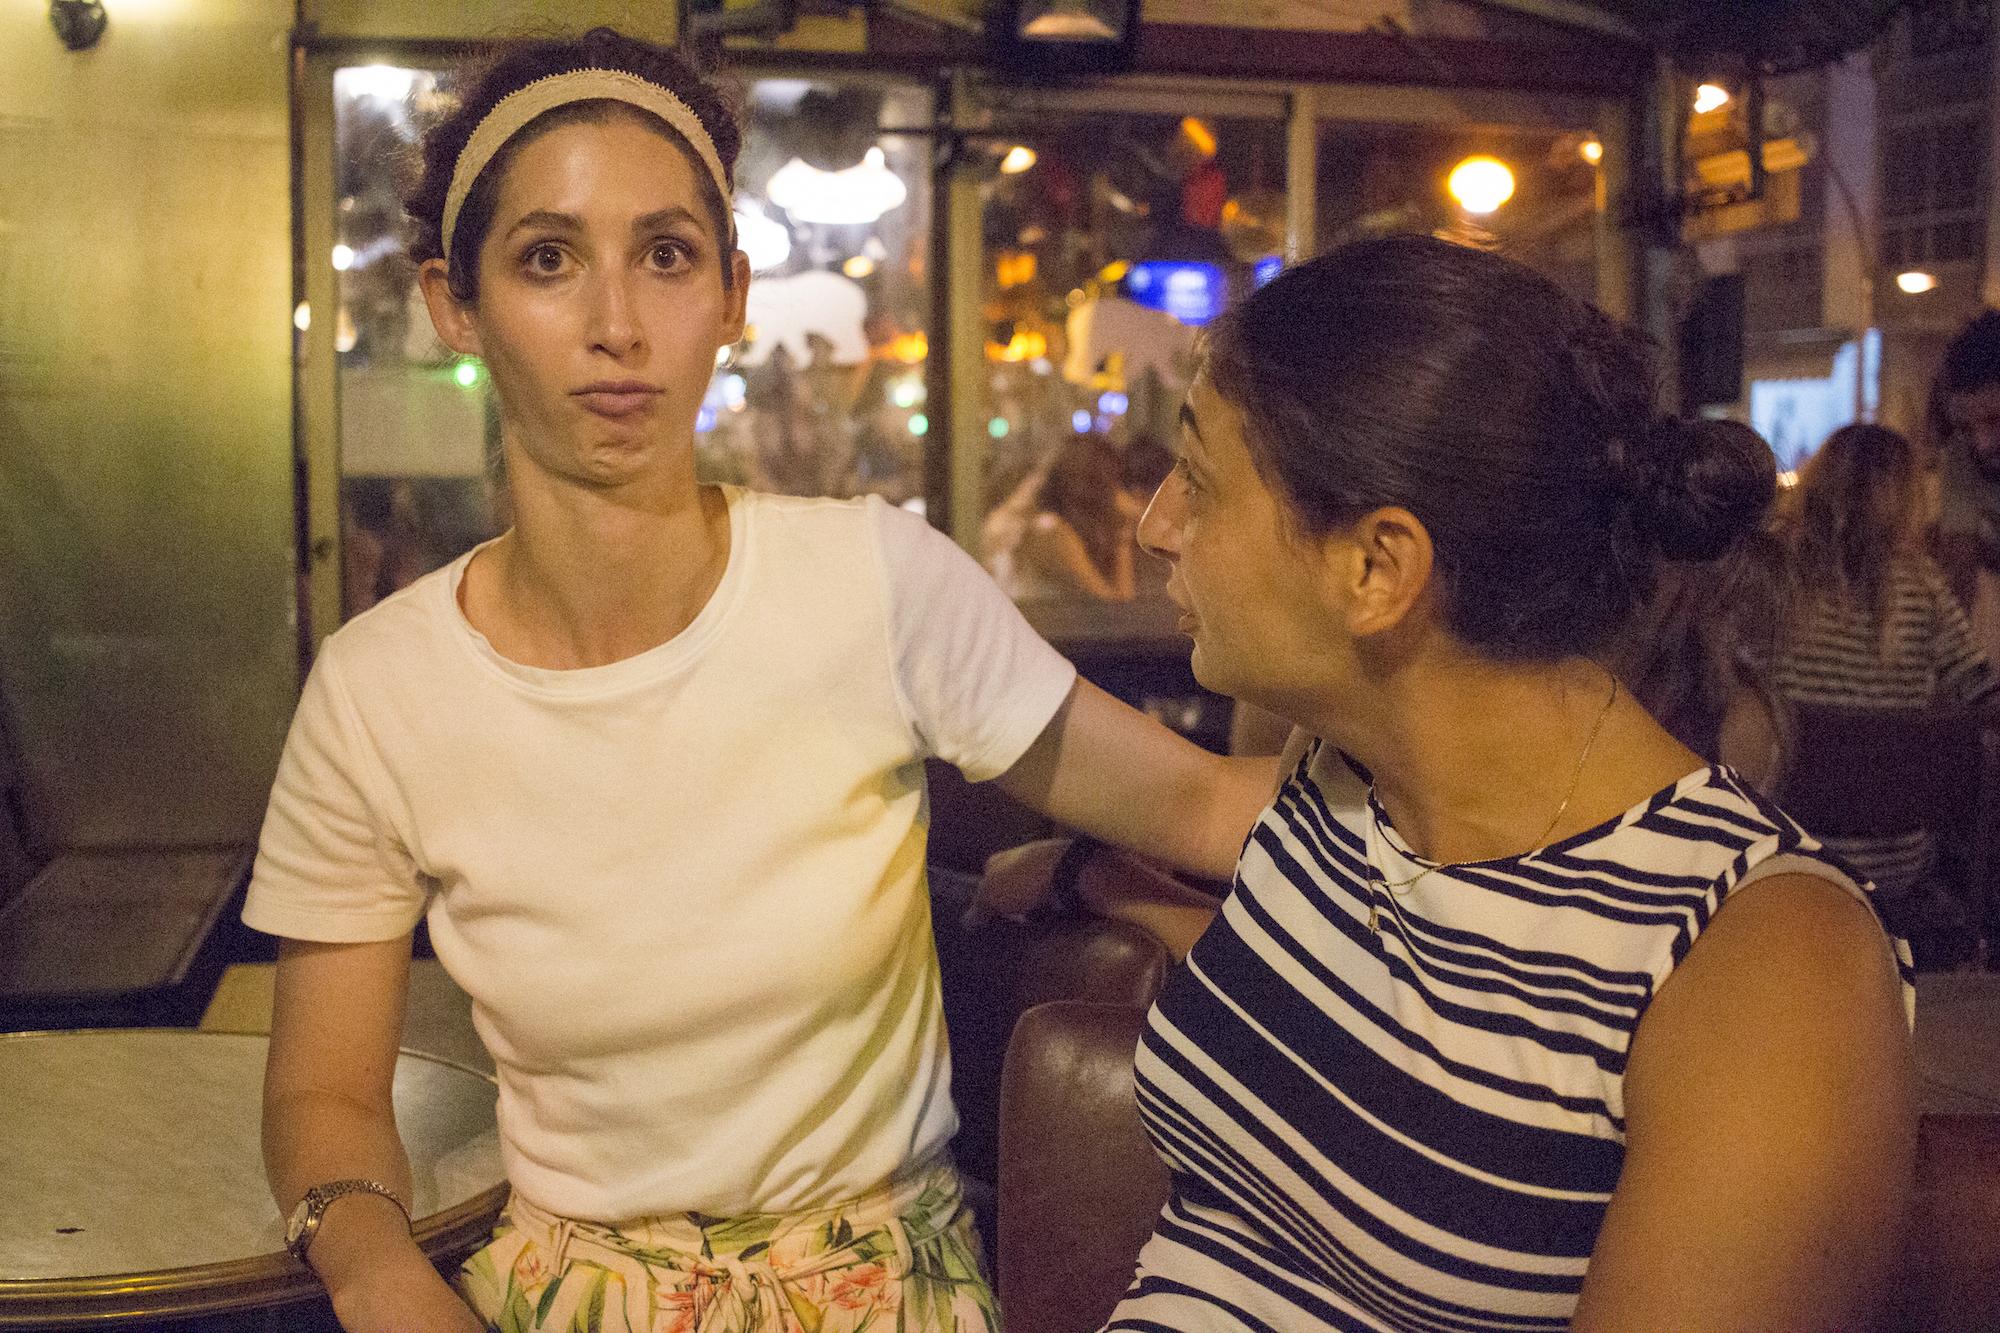 Geena Matuson (@geenamatuson) and Heather Luster in Rishon LeZion, Israel, September 2017.